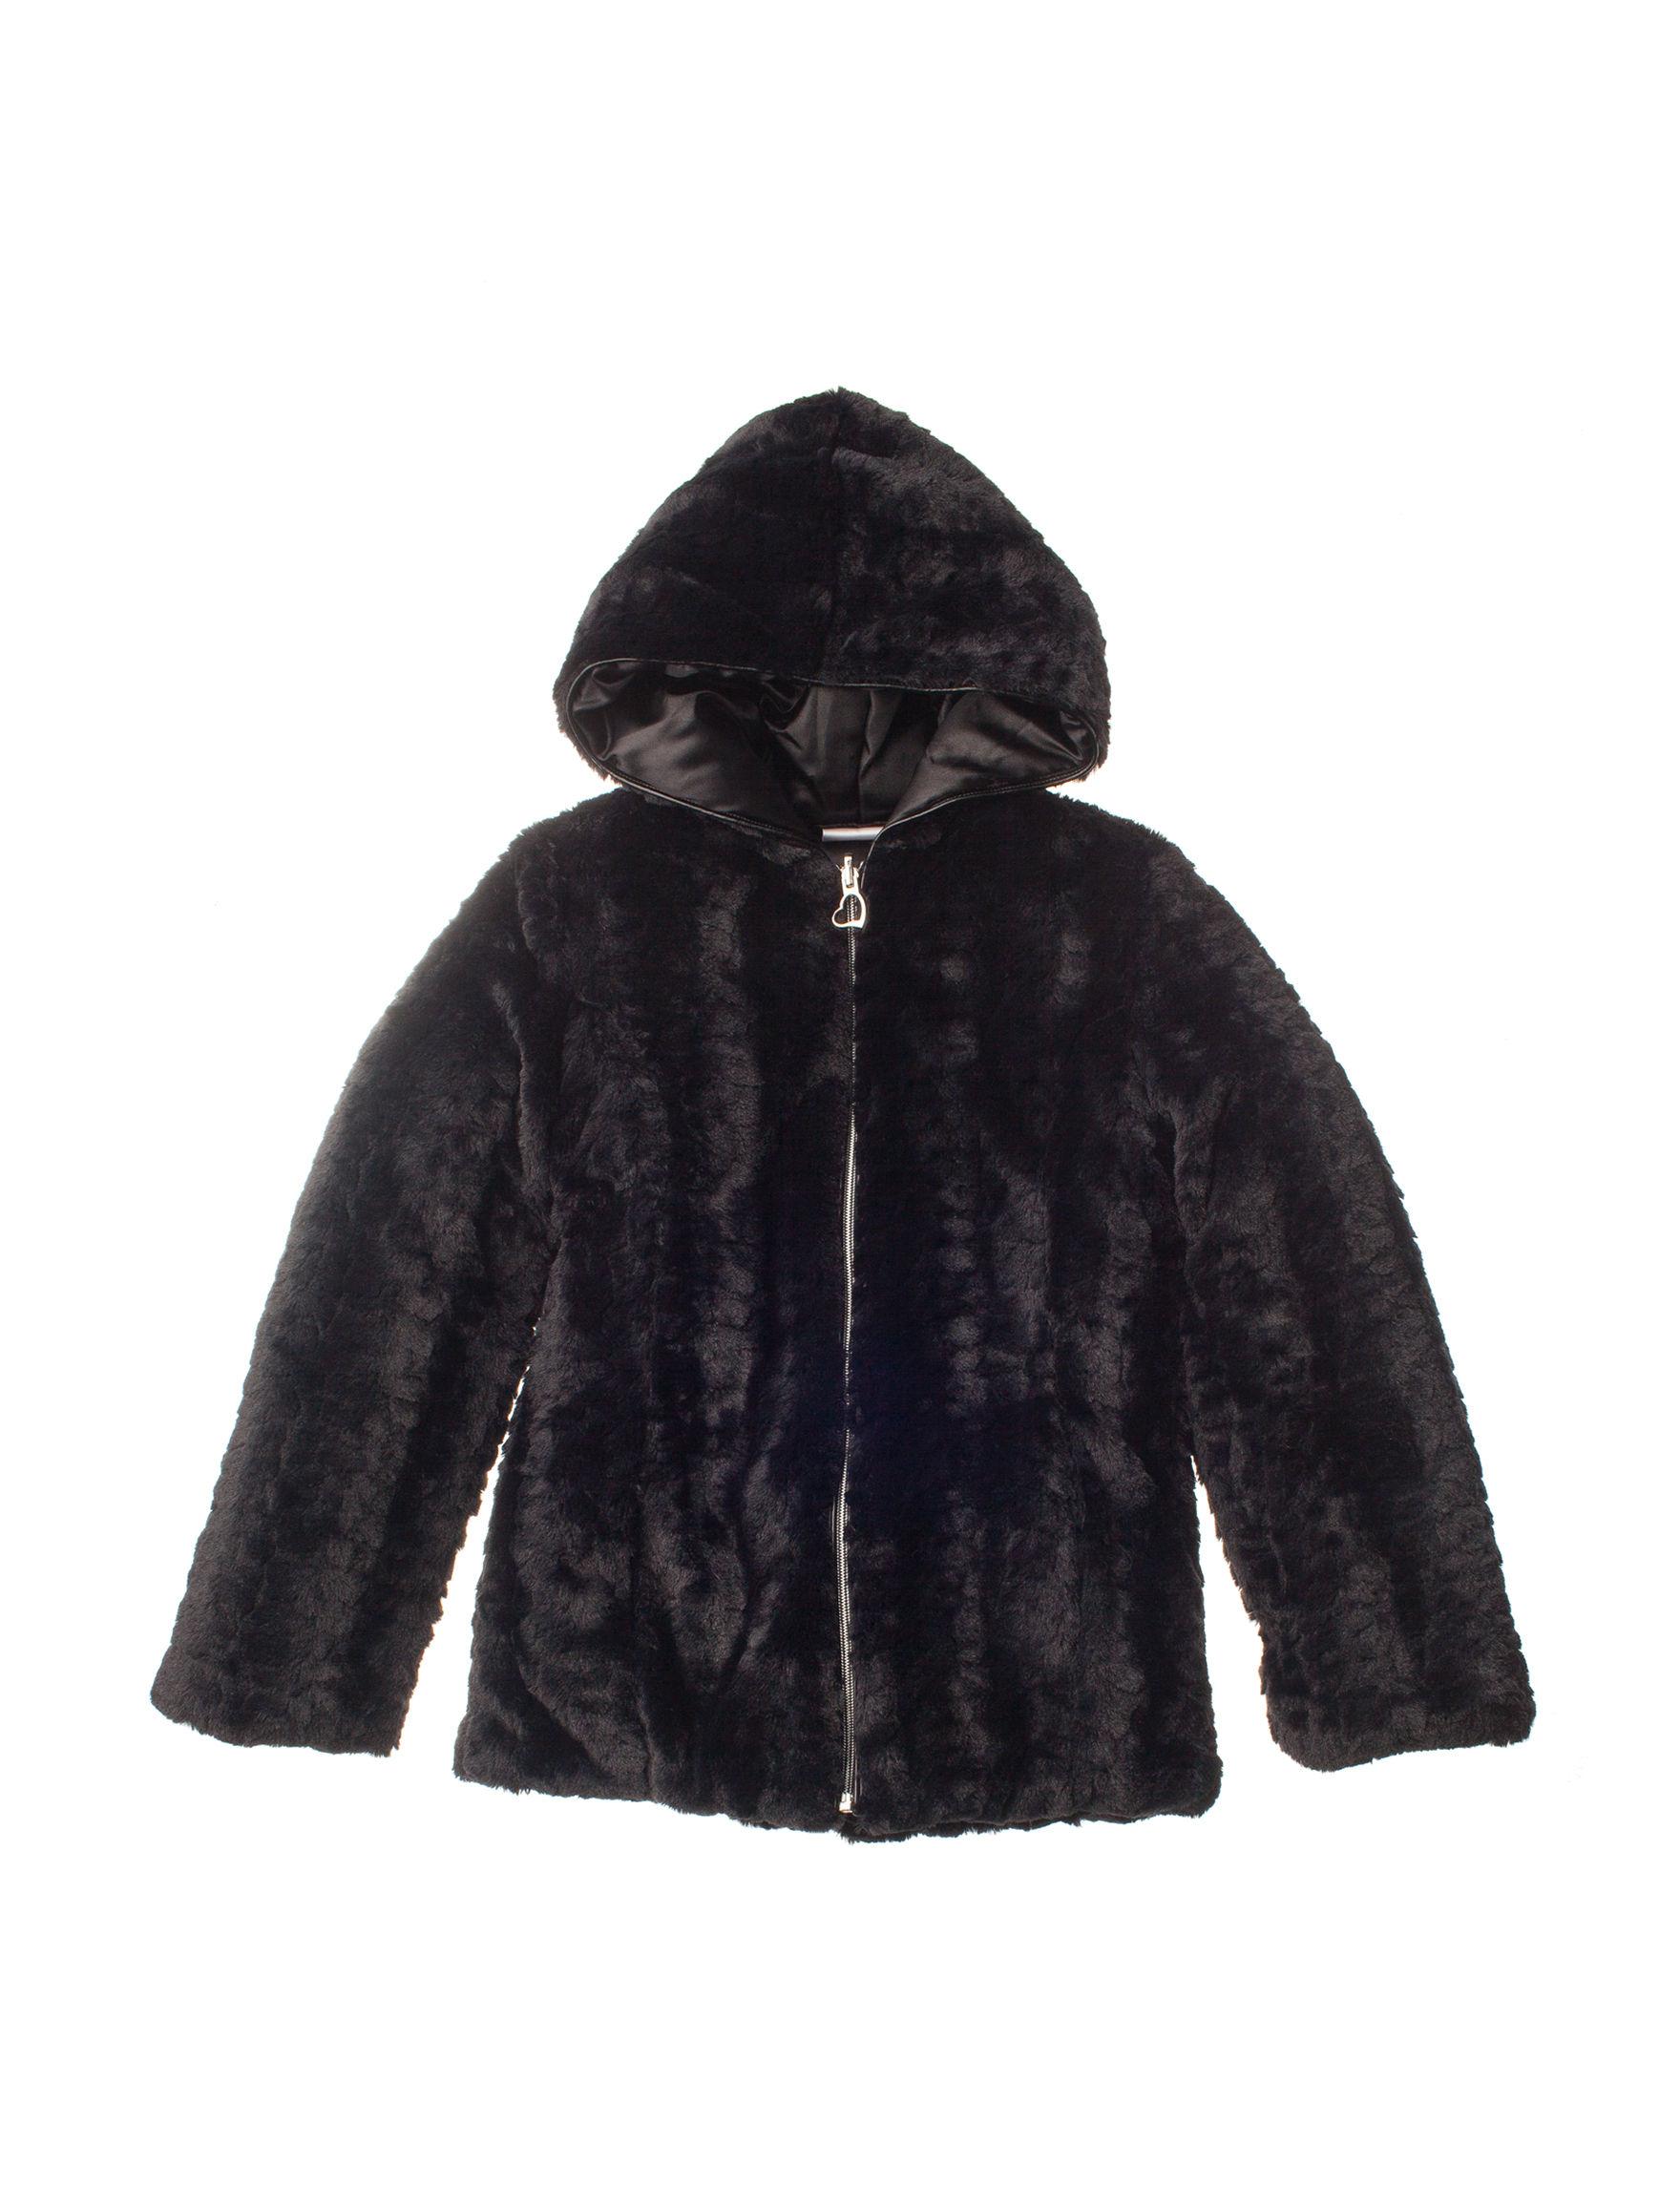 Laguna Black Fleece & Soft Shell Jackets